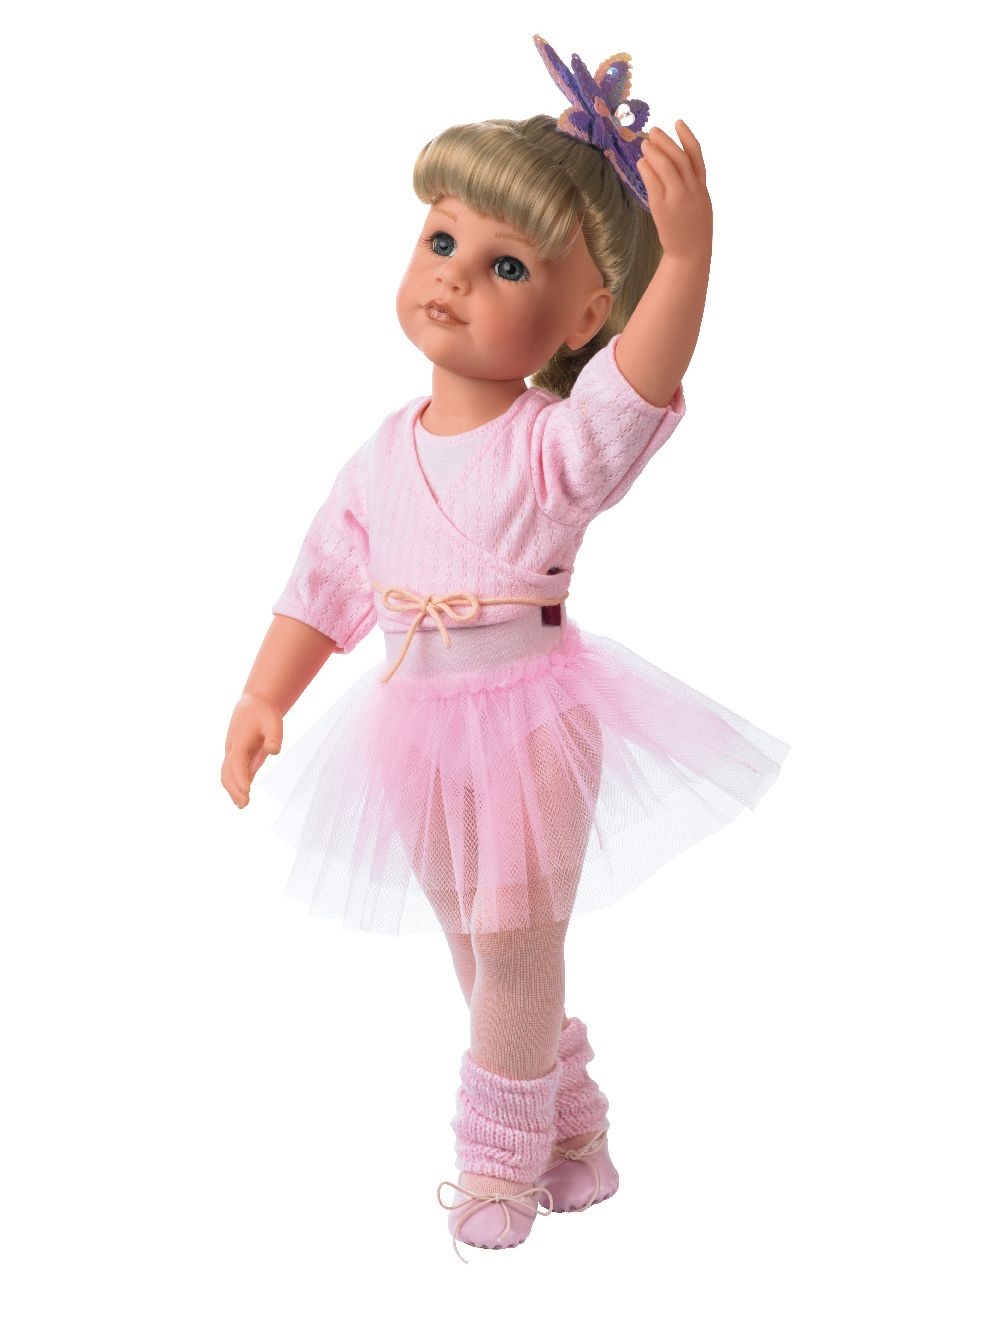 Hannah balletitund 50 cm Götz